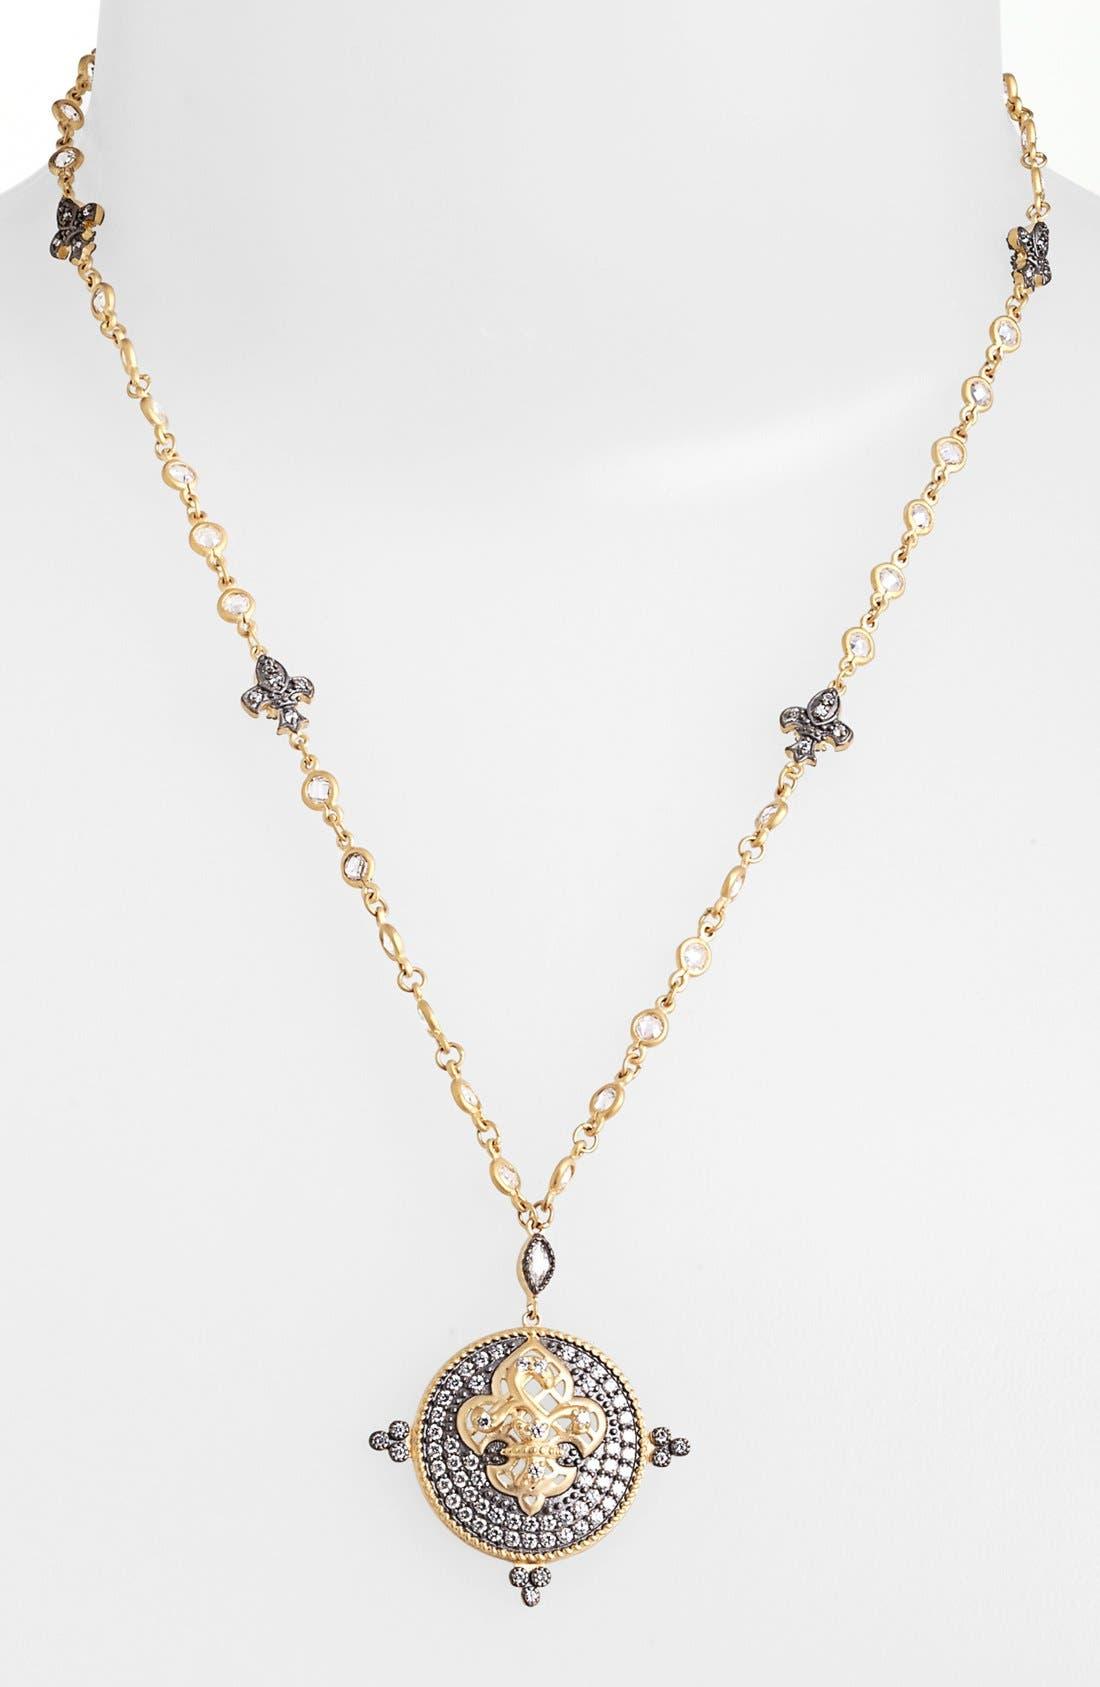 Alternate Image 1 Selected - FREIDA ROTHMAN 'Tribeca' Fleur de Lis Pendant Necklace